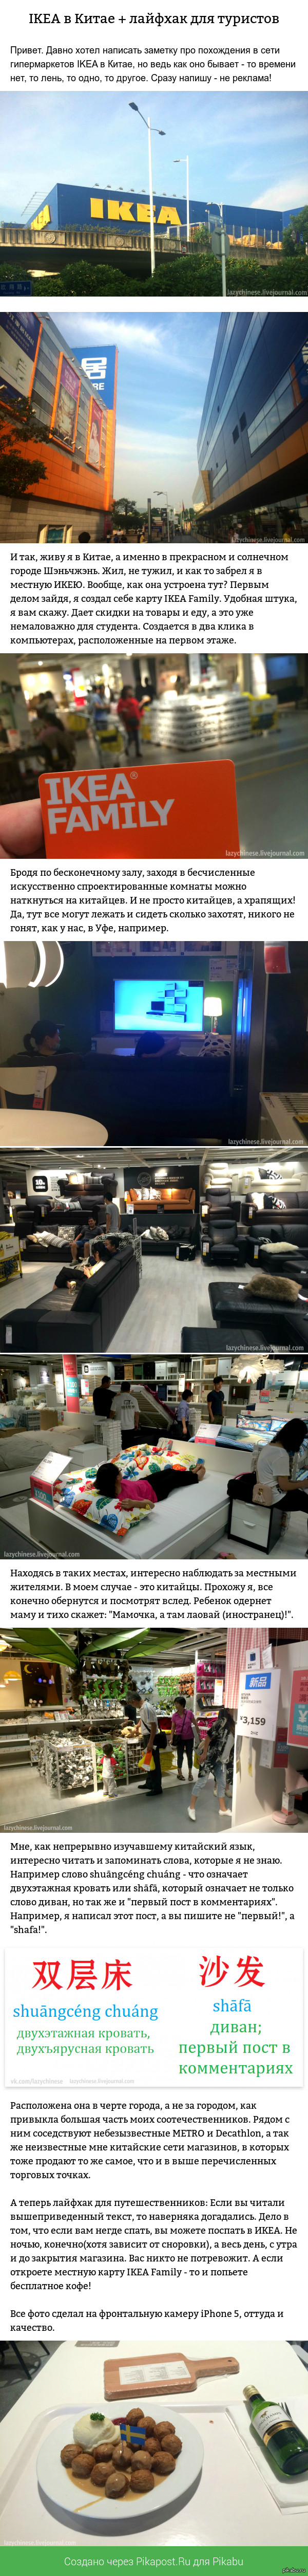 IKEA в Китае + лайфхак для туристов Оригинал поста взят из моего блога: lazychinese.livejournal.com